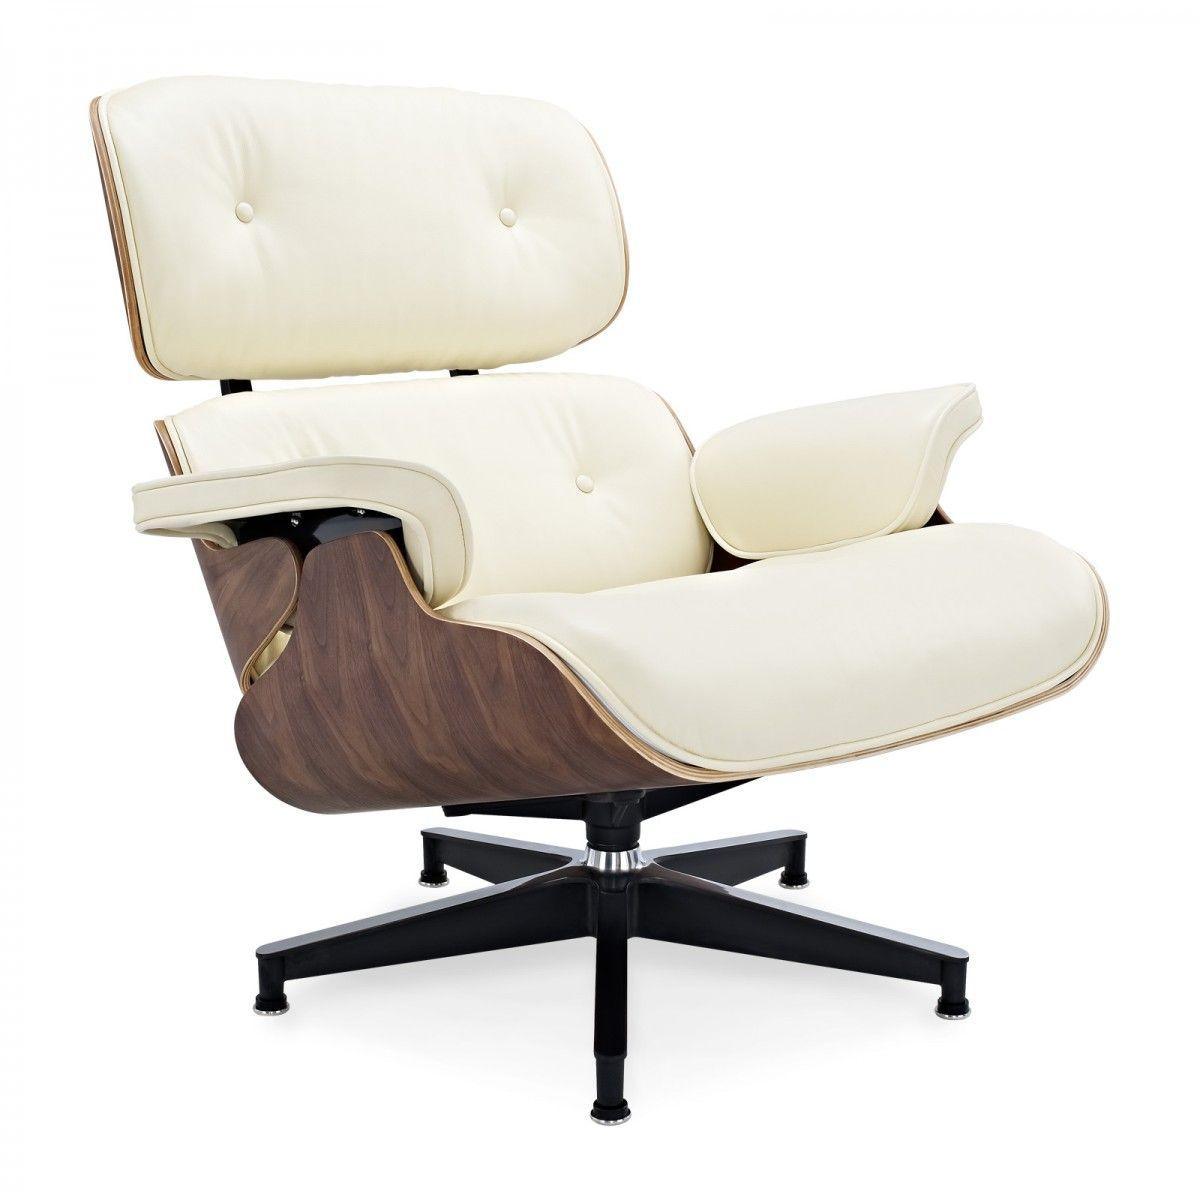 Lounge Stoel Eames.Lounge Chair Stoel Eames Design Stoelen Voga Eames